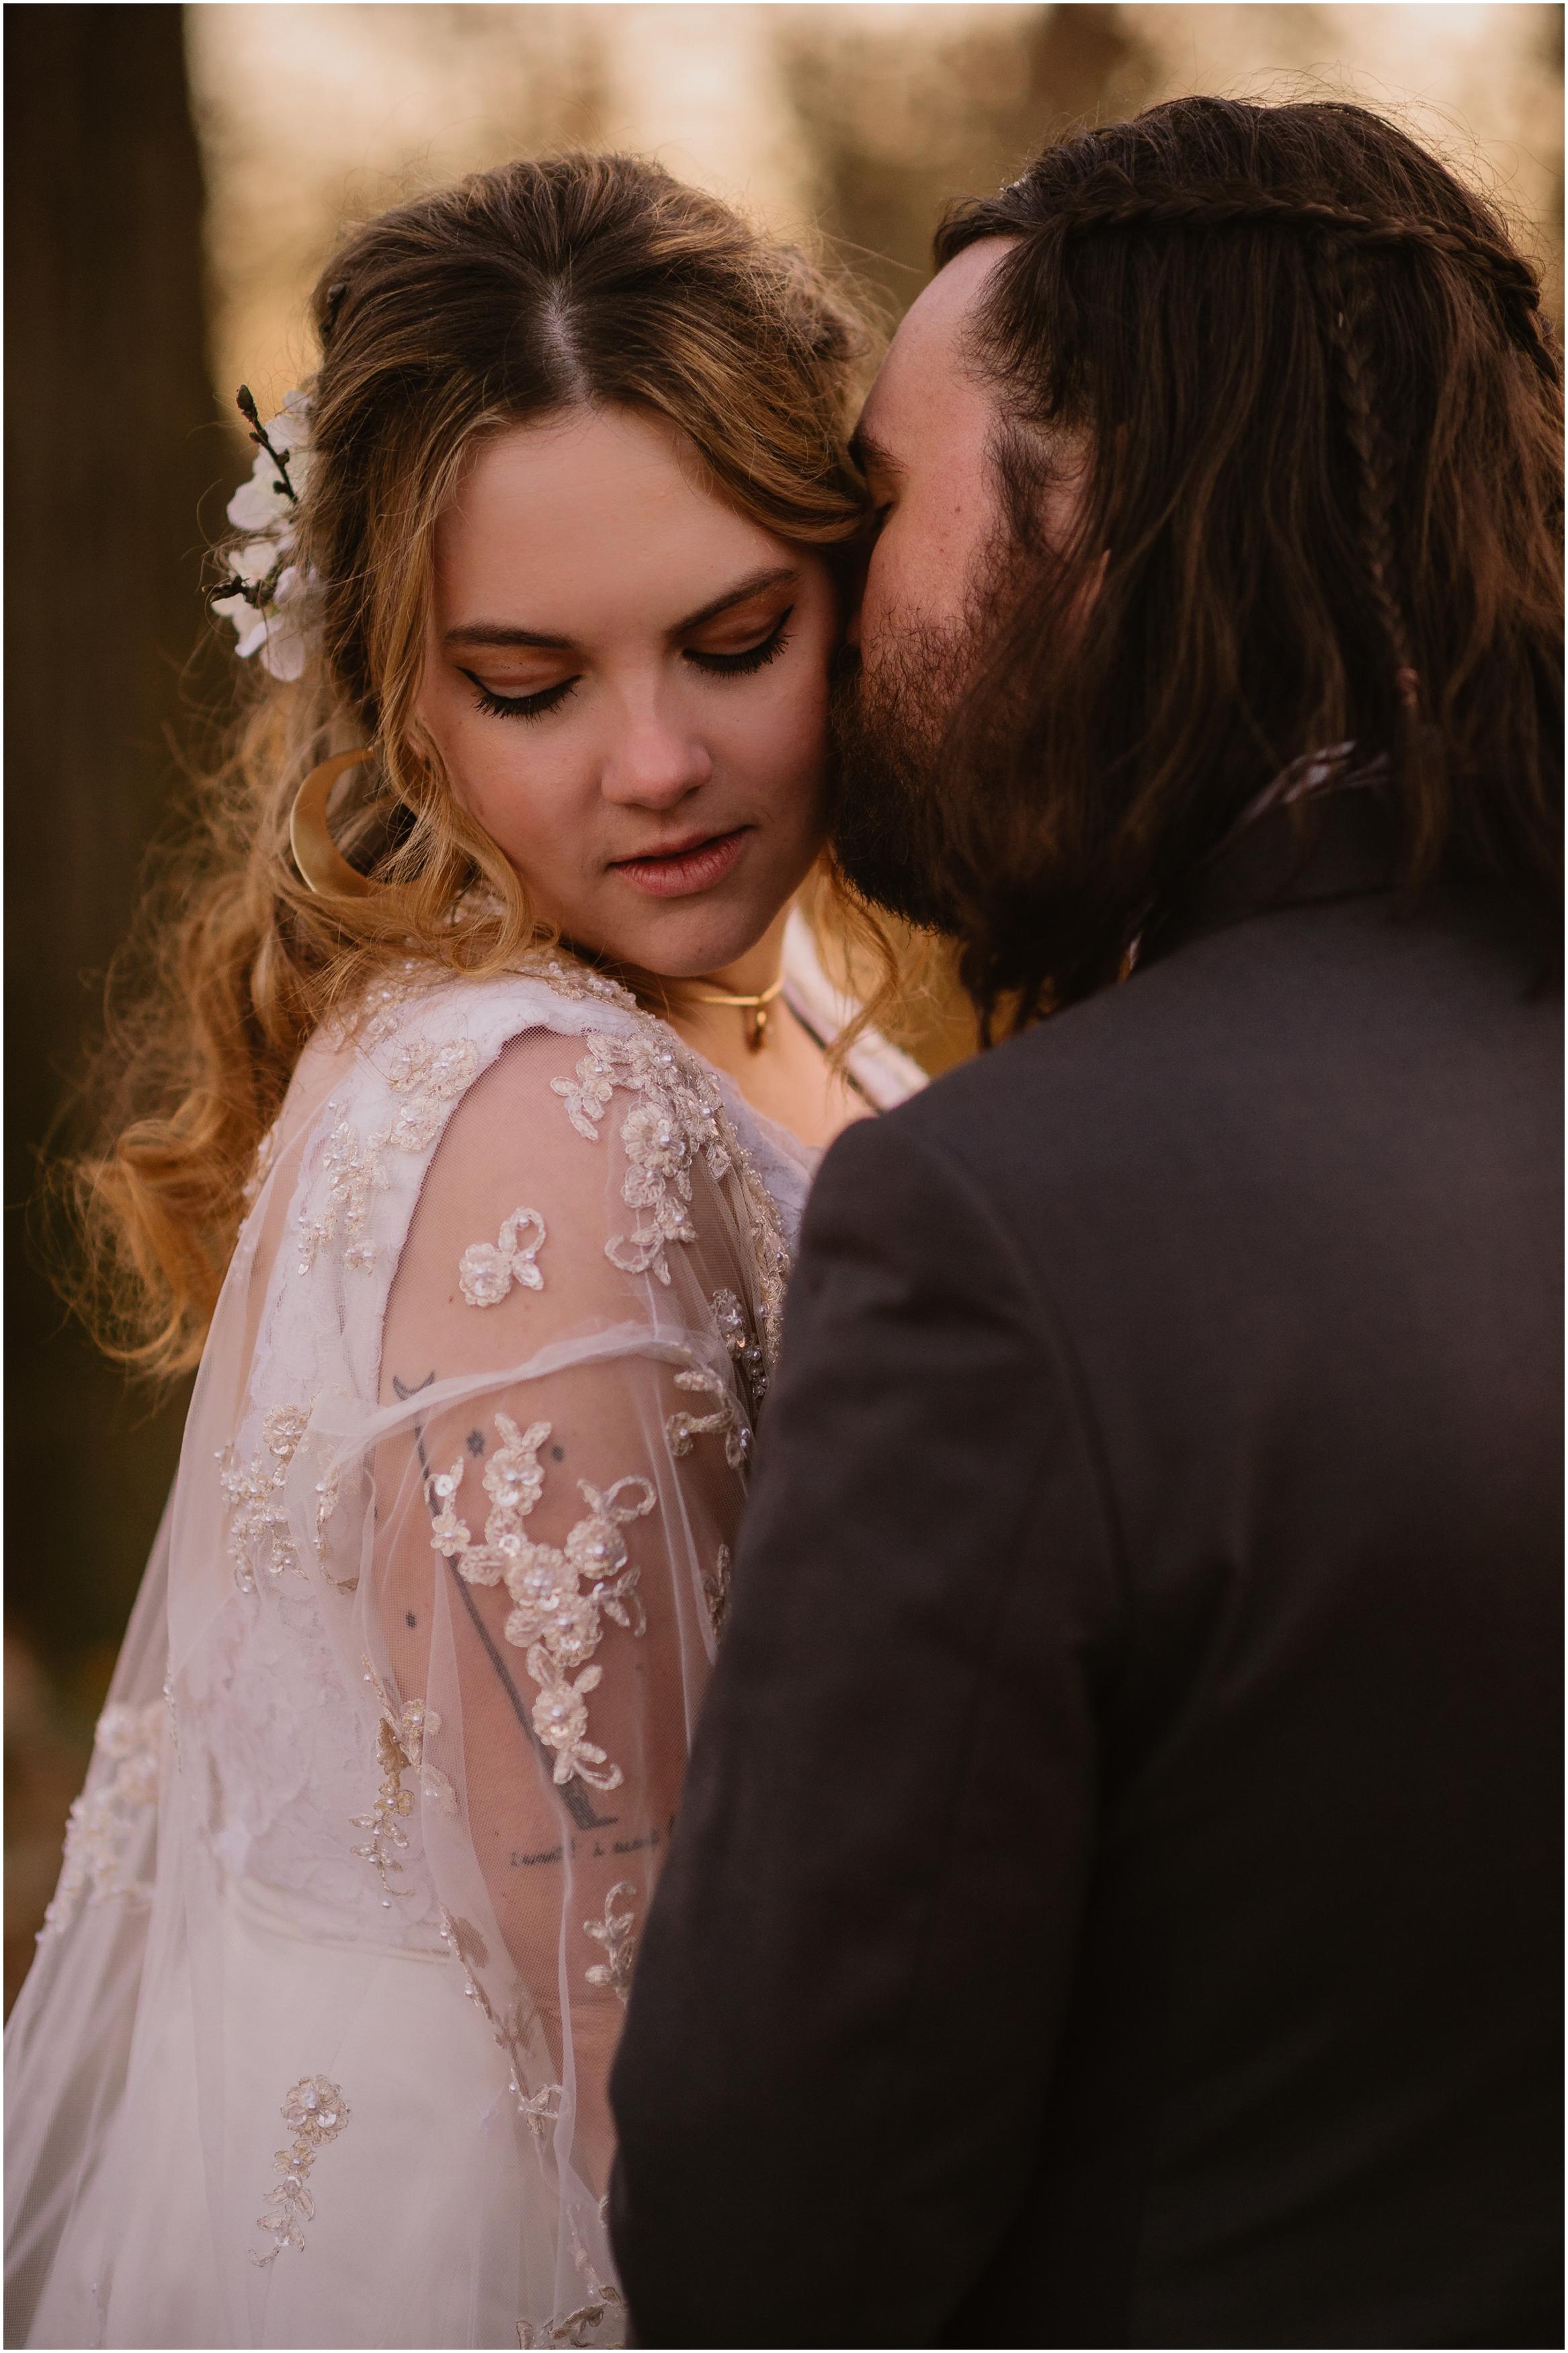 Rebecca_Shehorn_Photography_Indianapolis_Wedding_Photographer_9444.jpg